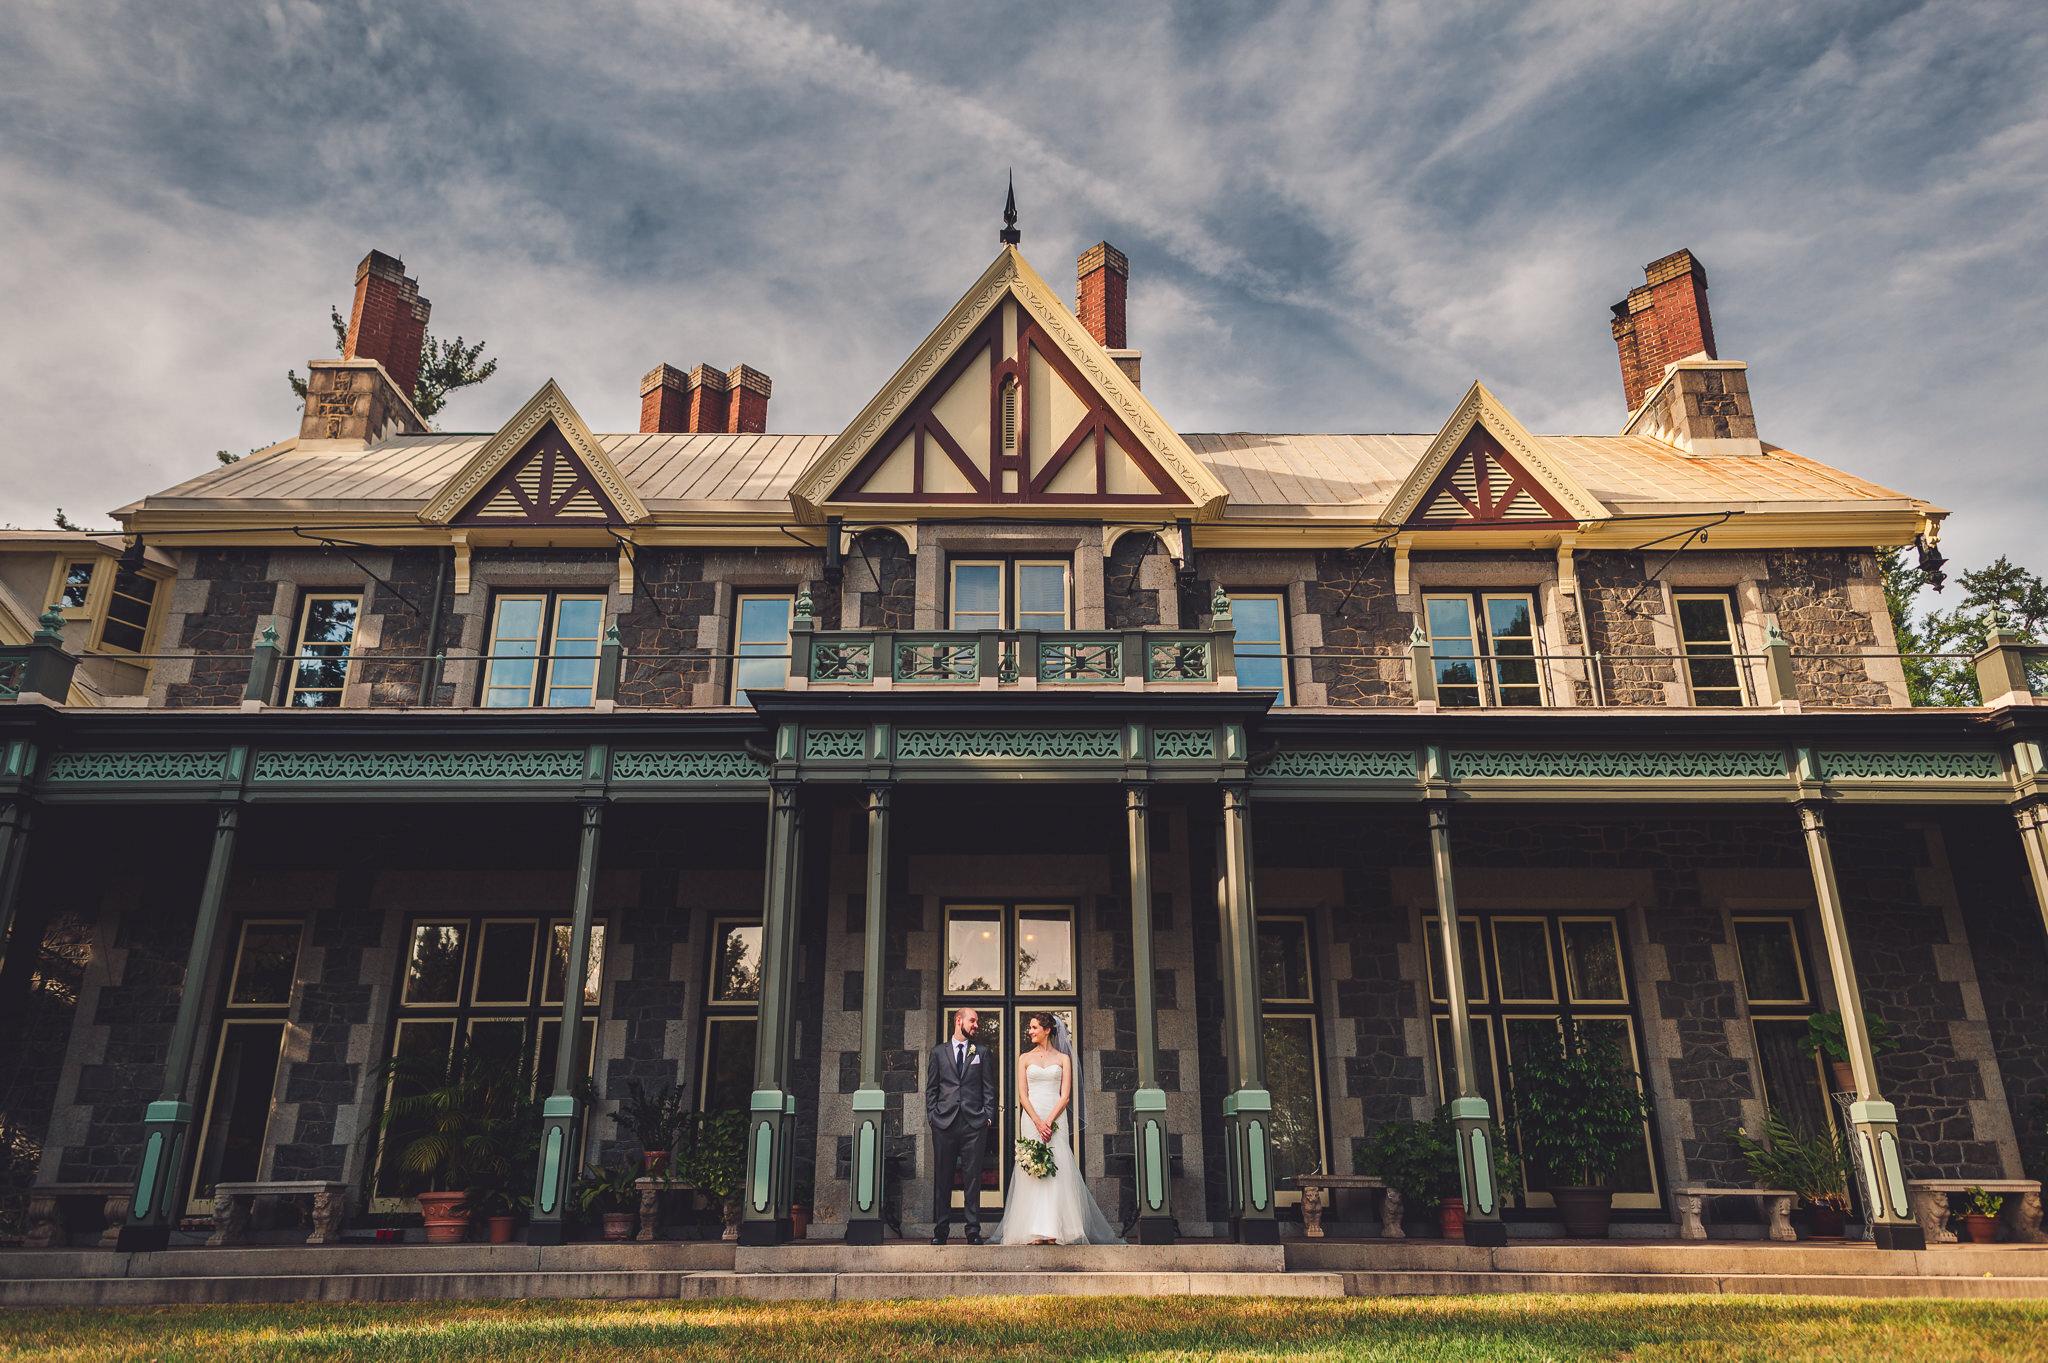 Carriage-House-at-Rockwood-Park-Wedding-0001.jpg